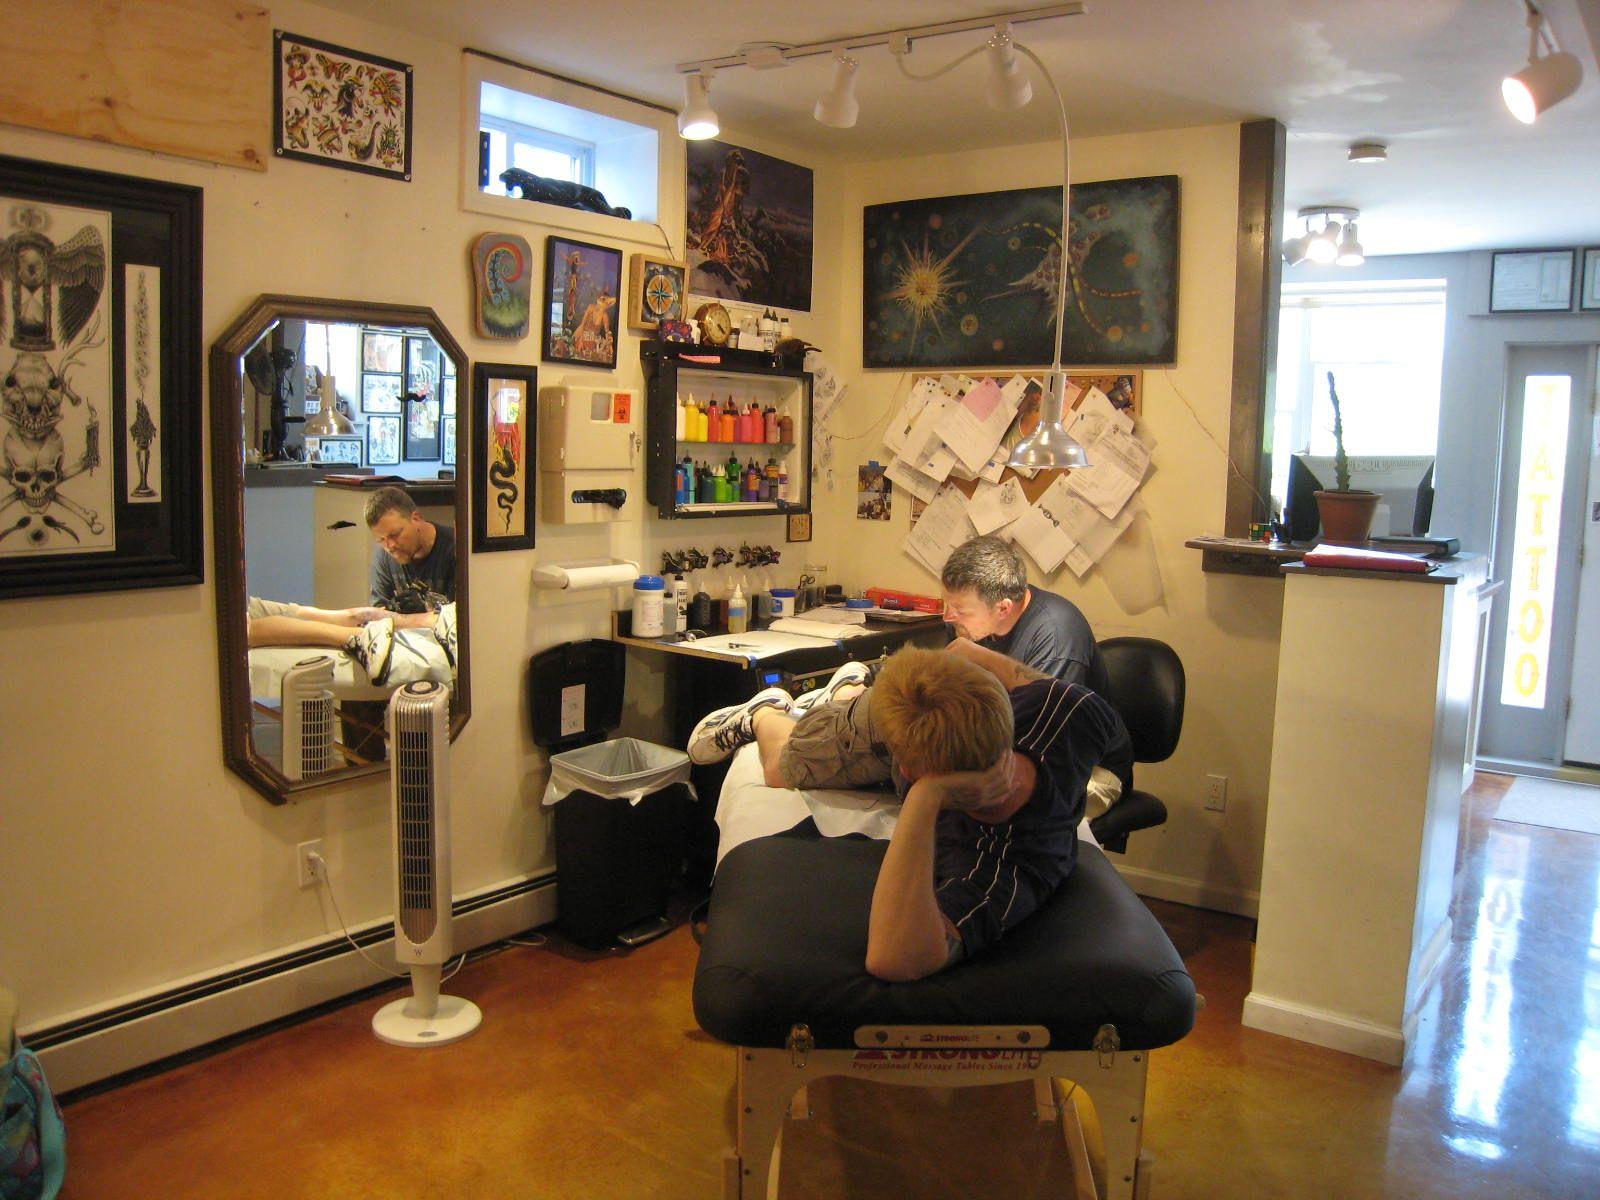 tattoo shop Tattoo studio interior, Studio interior